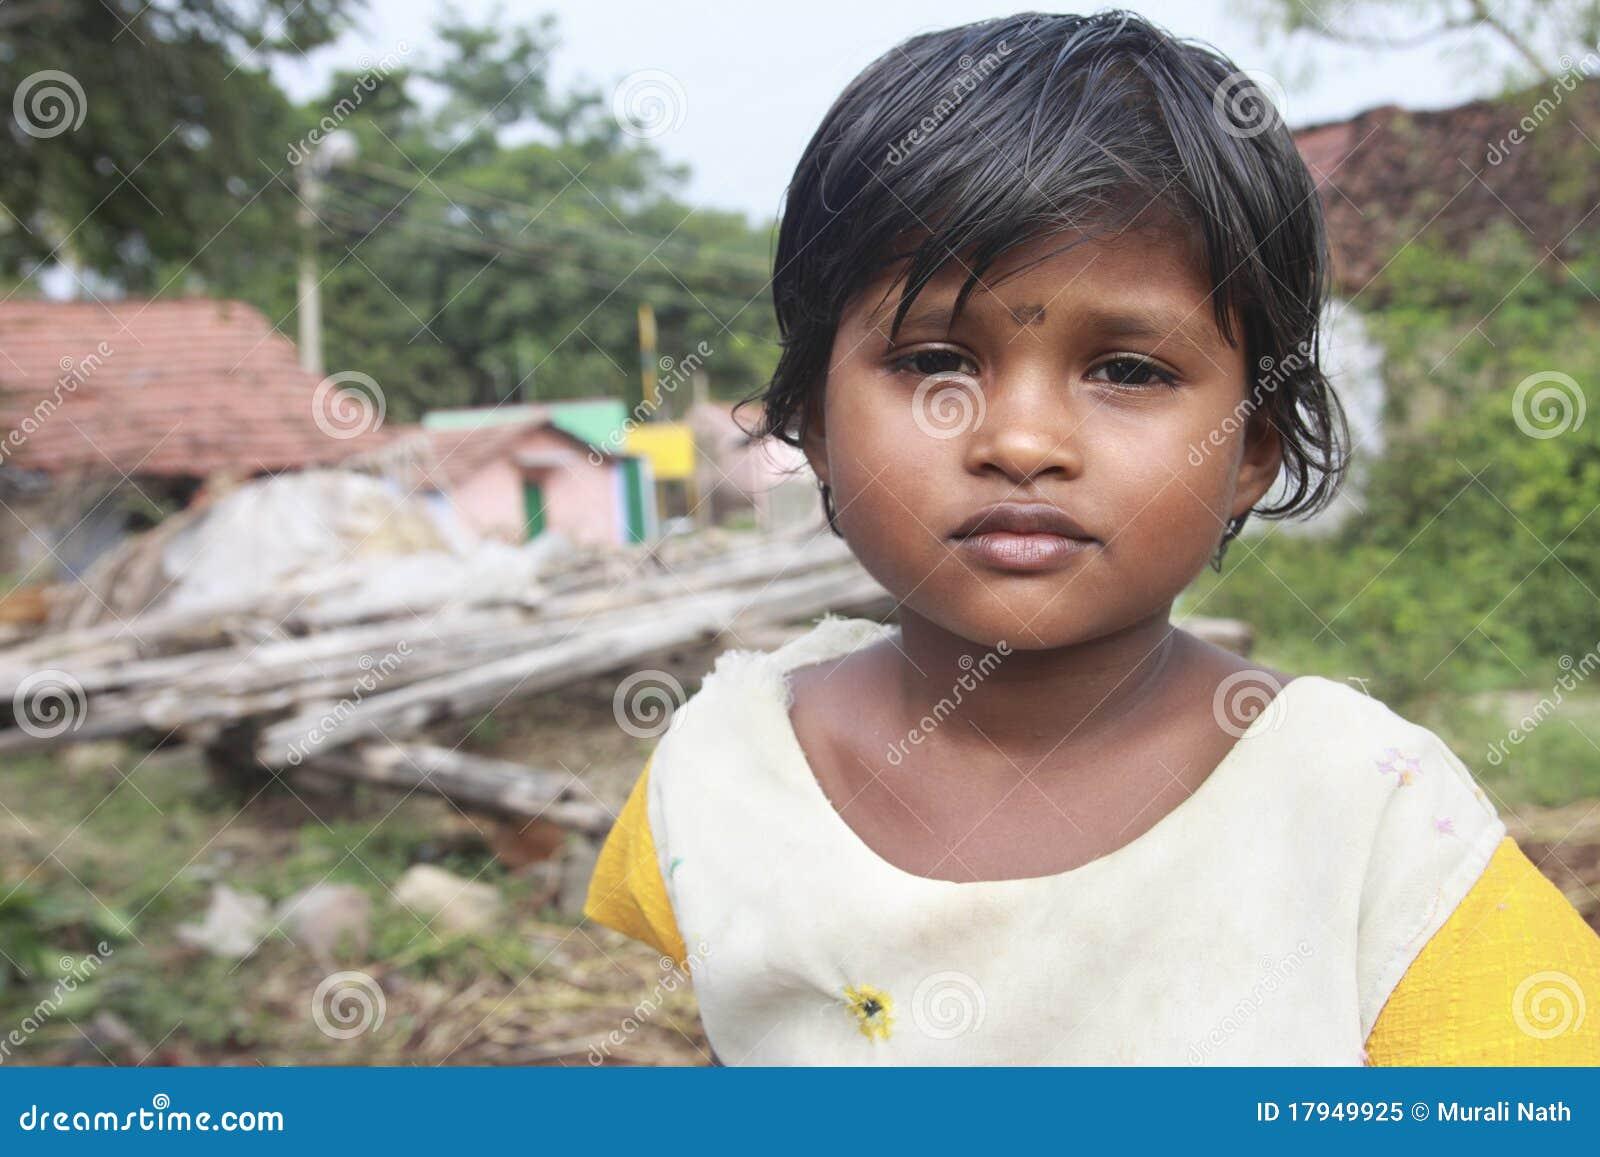 Indian Village Girl Stock Image Image Of Innocently - 17949925-1988